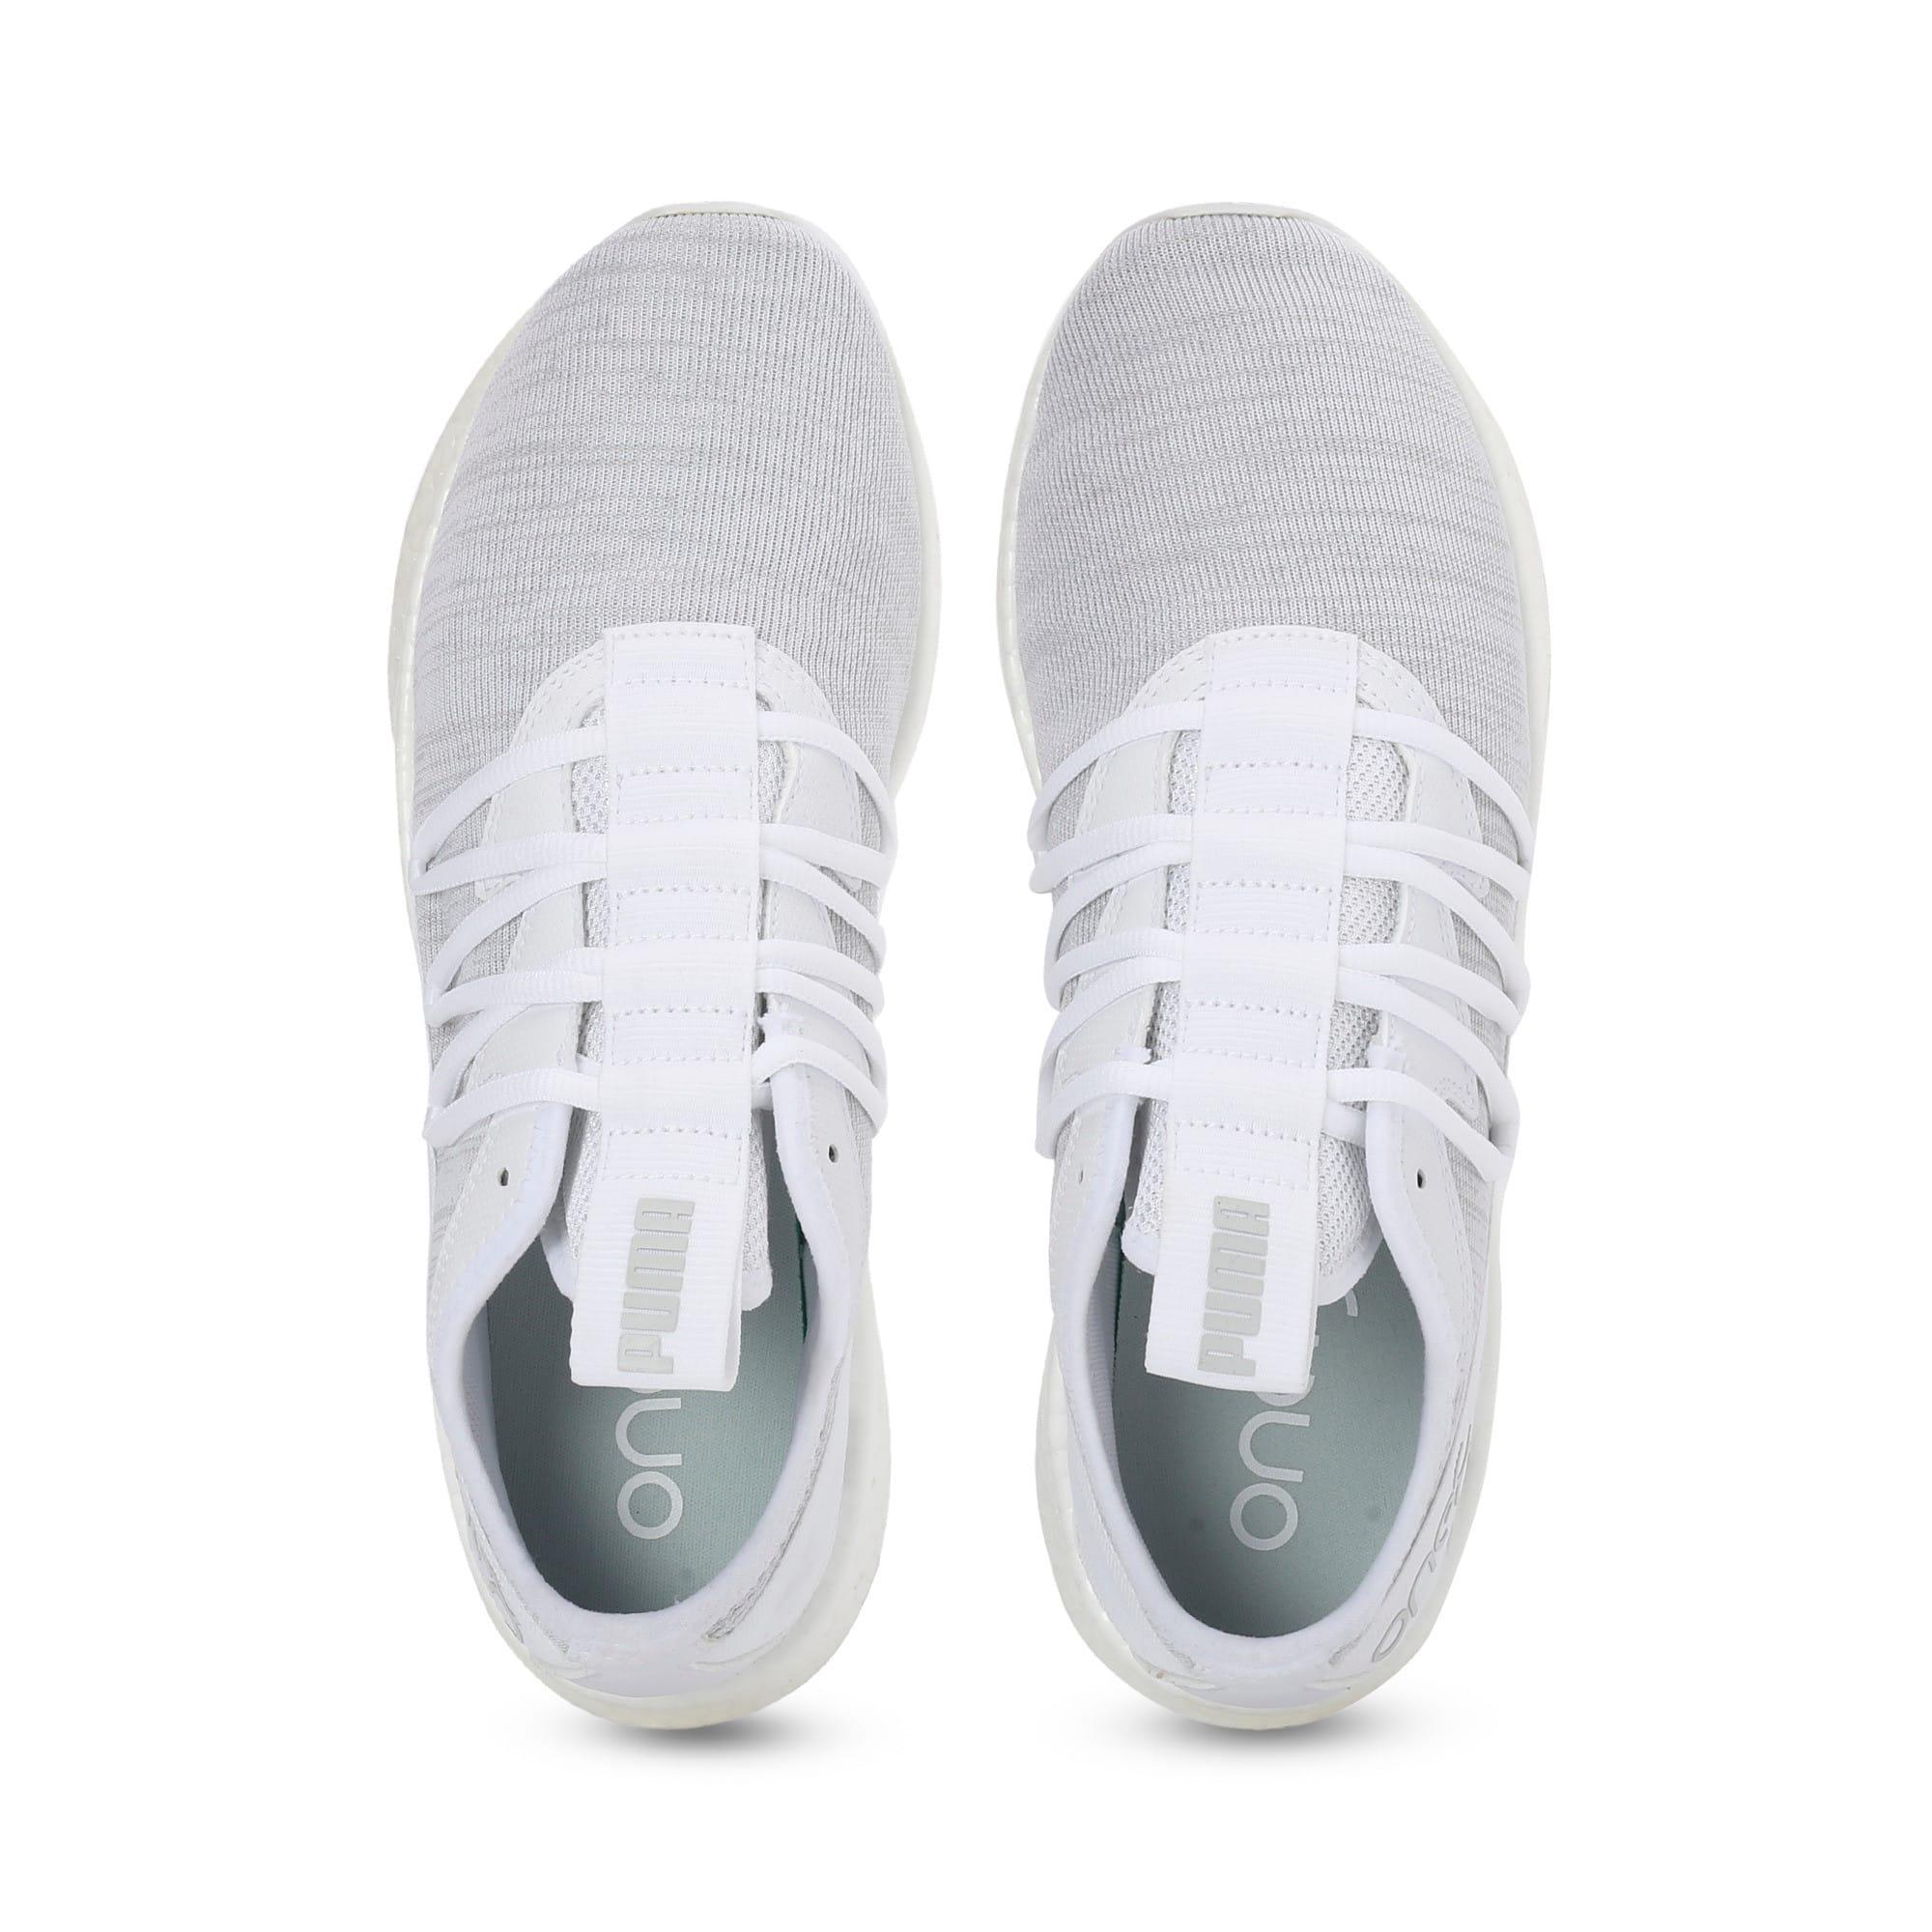 Thumbnail 5 of NRGY Star Knit one8 Unisex Running Shoes, Puma White-Glacier Gray, medium-IND